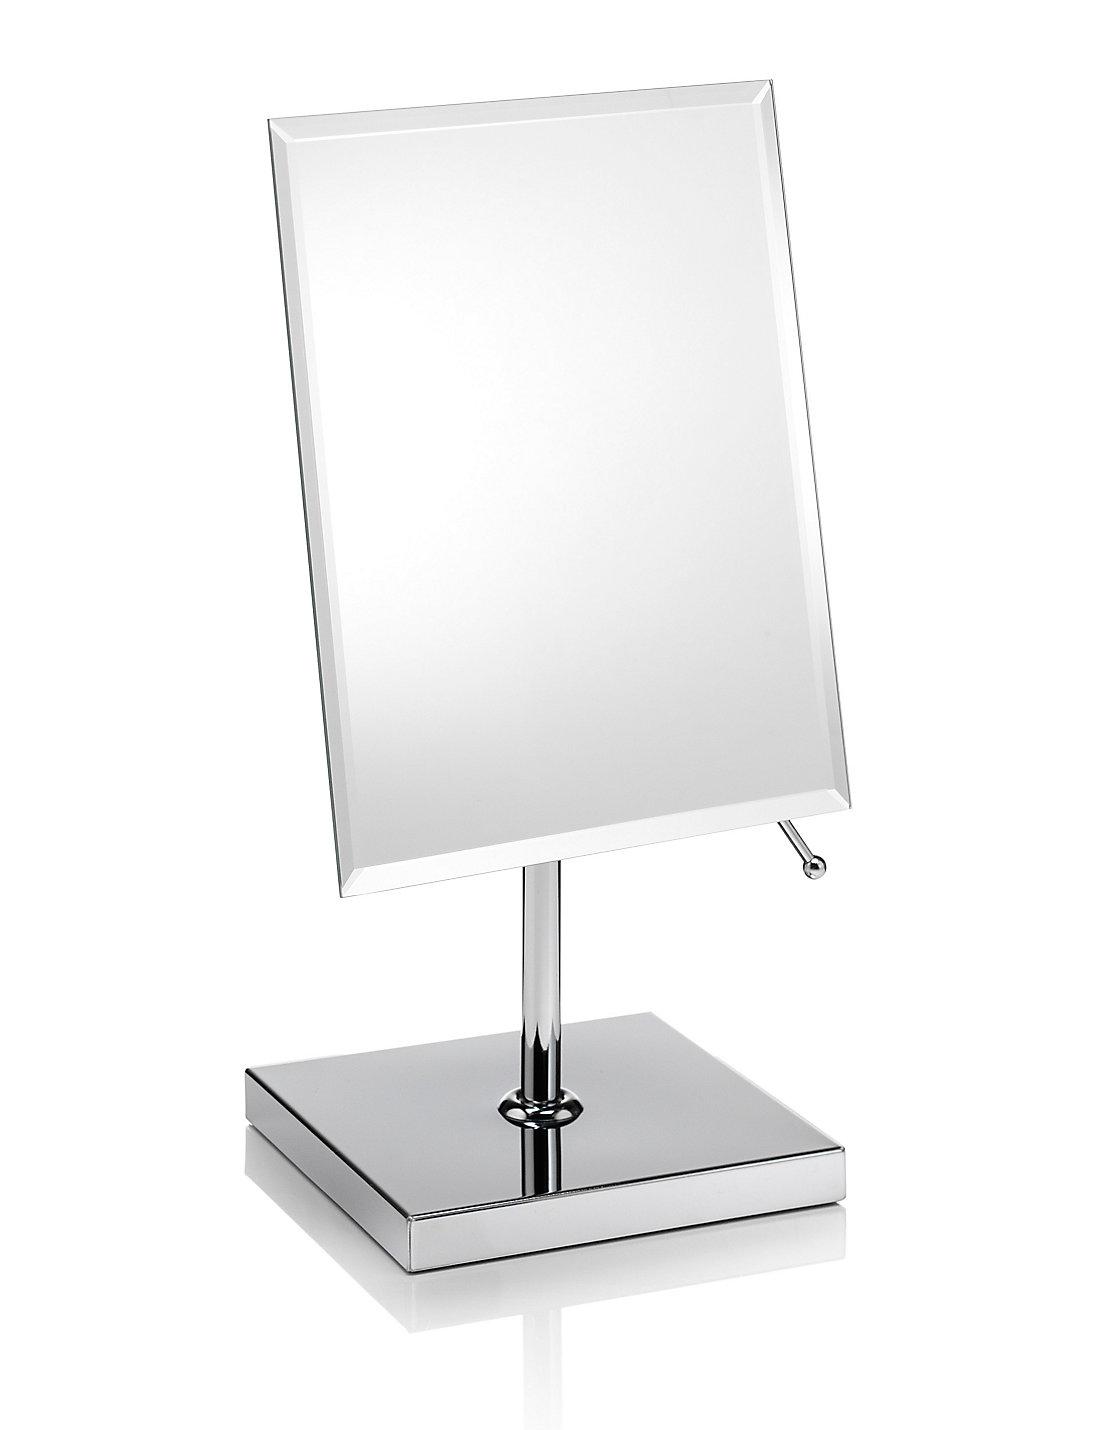 Extendable Mirror Bathroom Bathroom Mirrors Round Oval Bathroom Mirror Cabinets Ms